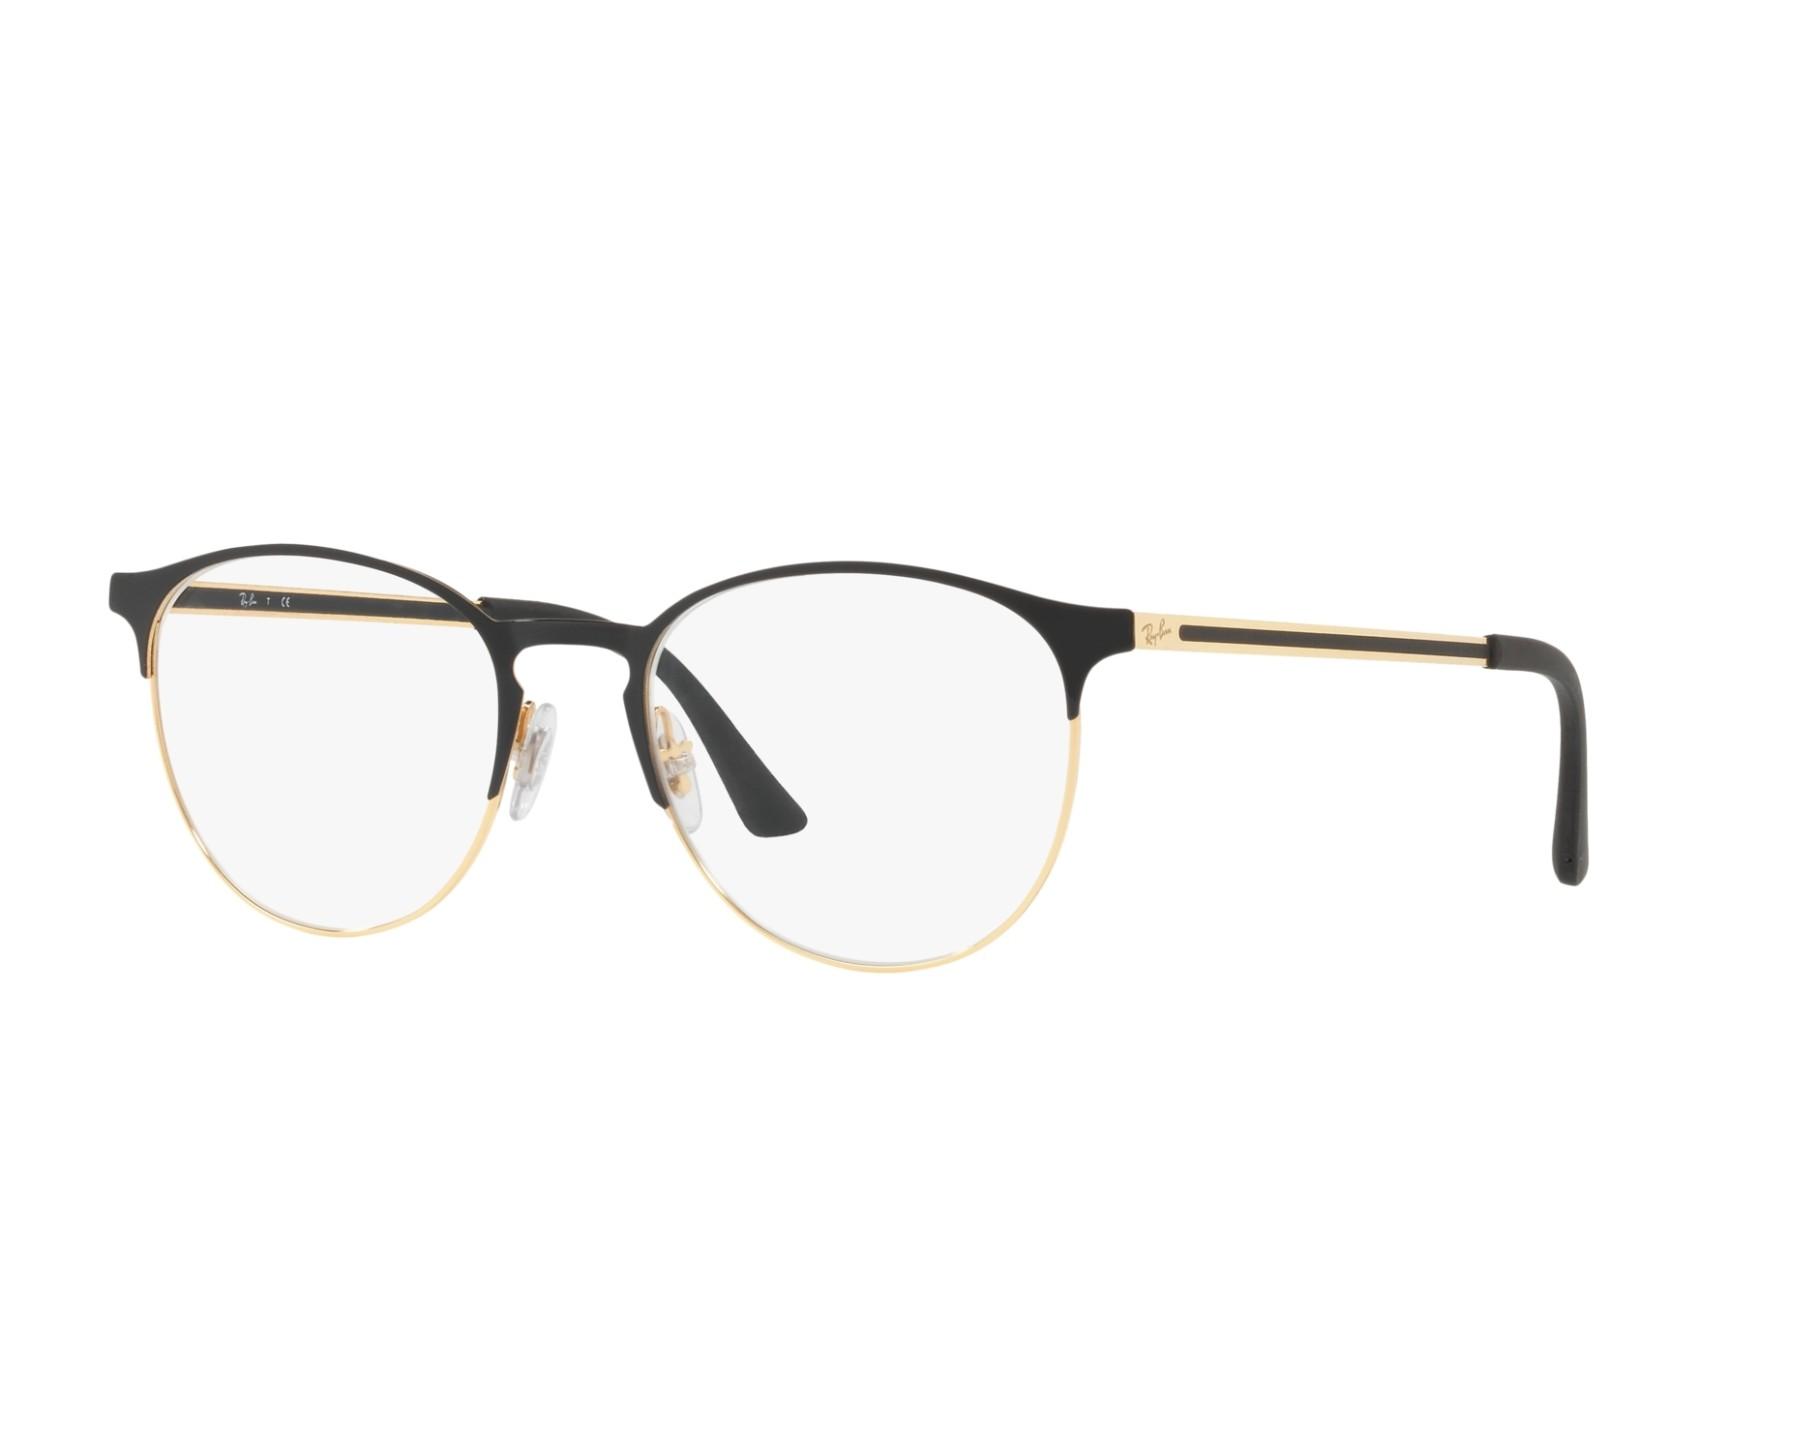 c6547636bd6 eyeglasses Ray-Ban RX-6375 2890 51-18 Black Gold